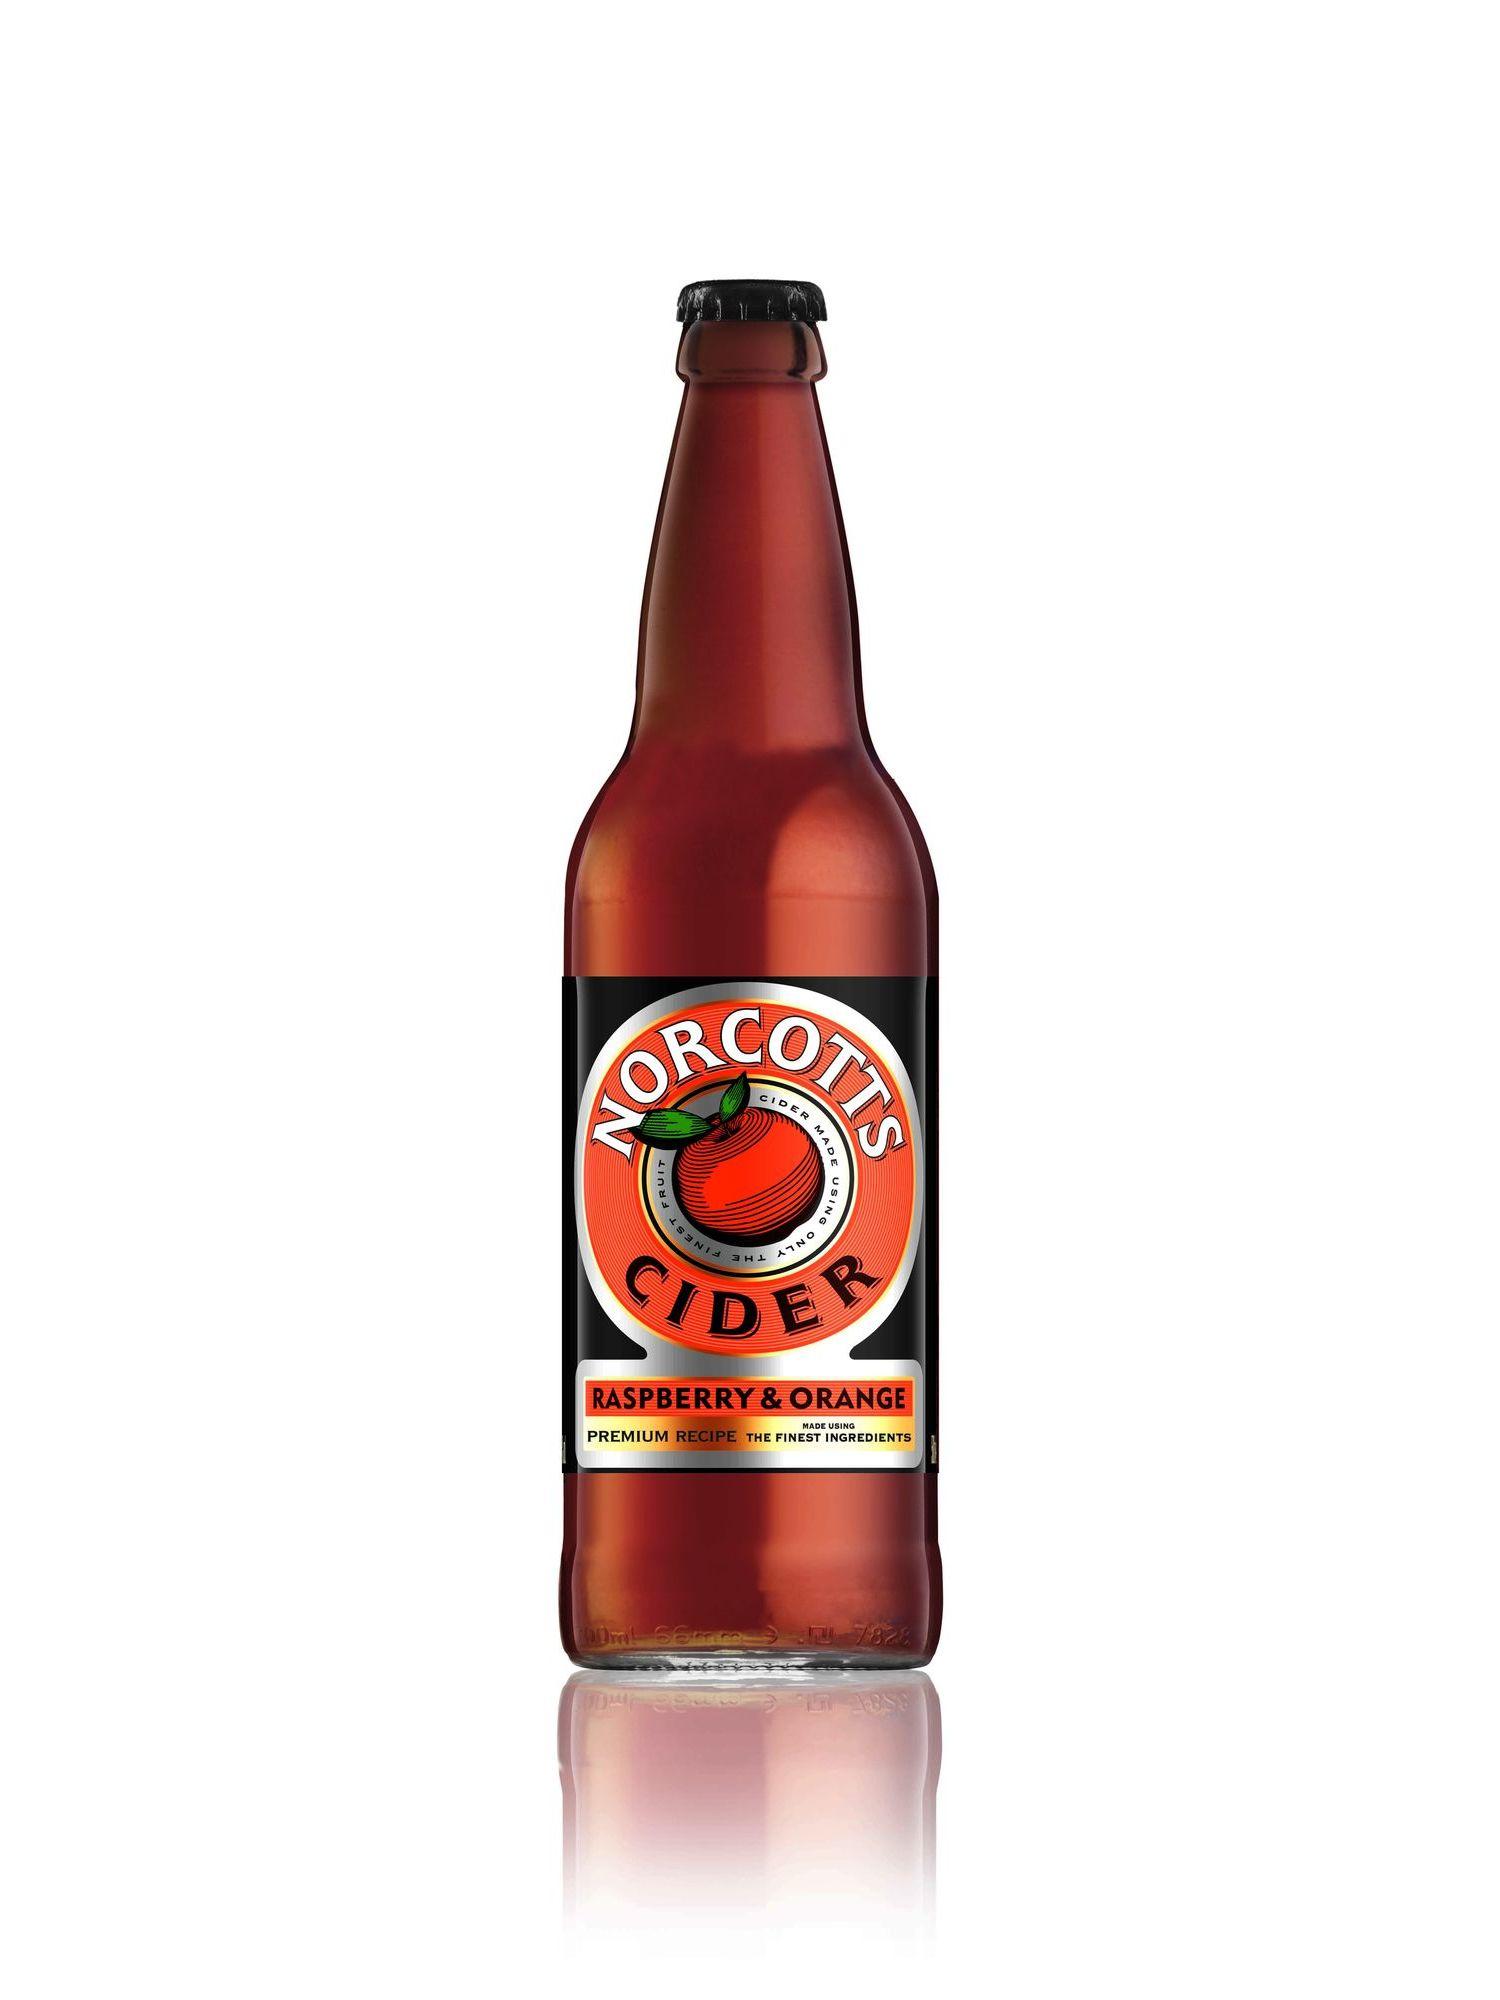 Norcott's Raspberry & Orange Cider